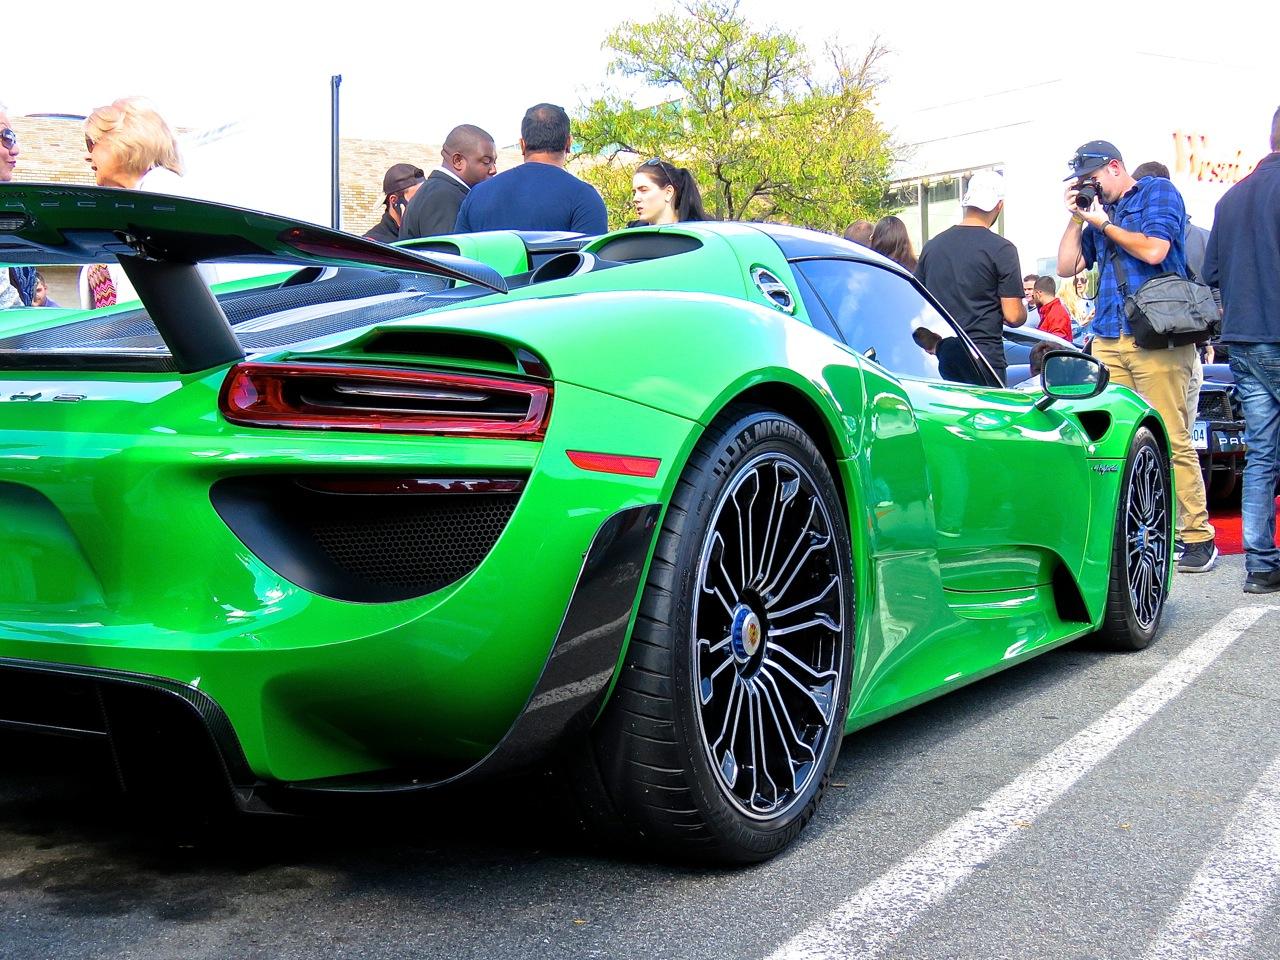 Green Porsche 918 Cars and Caffe 4